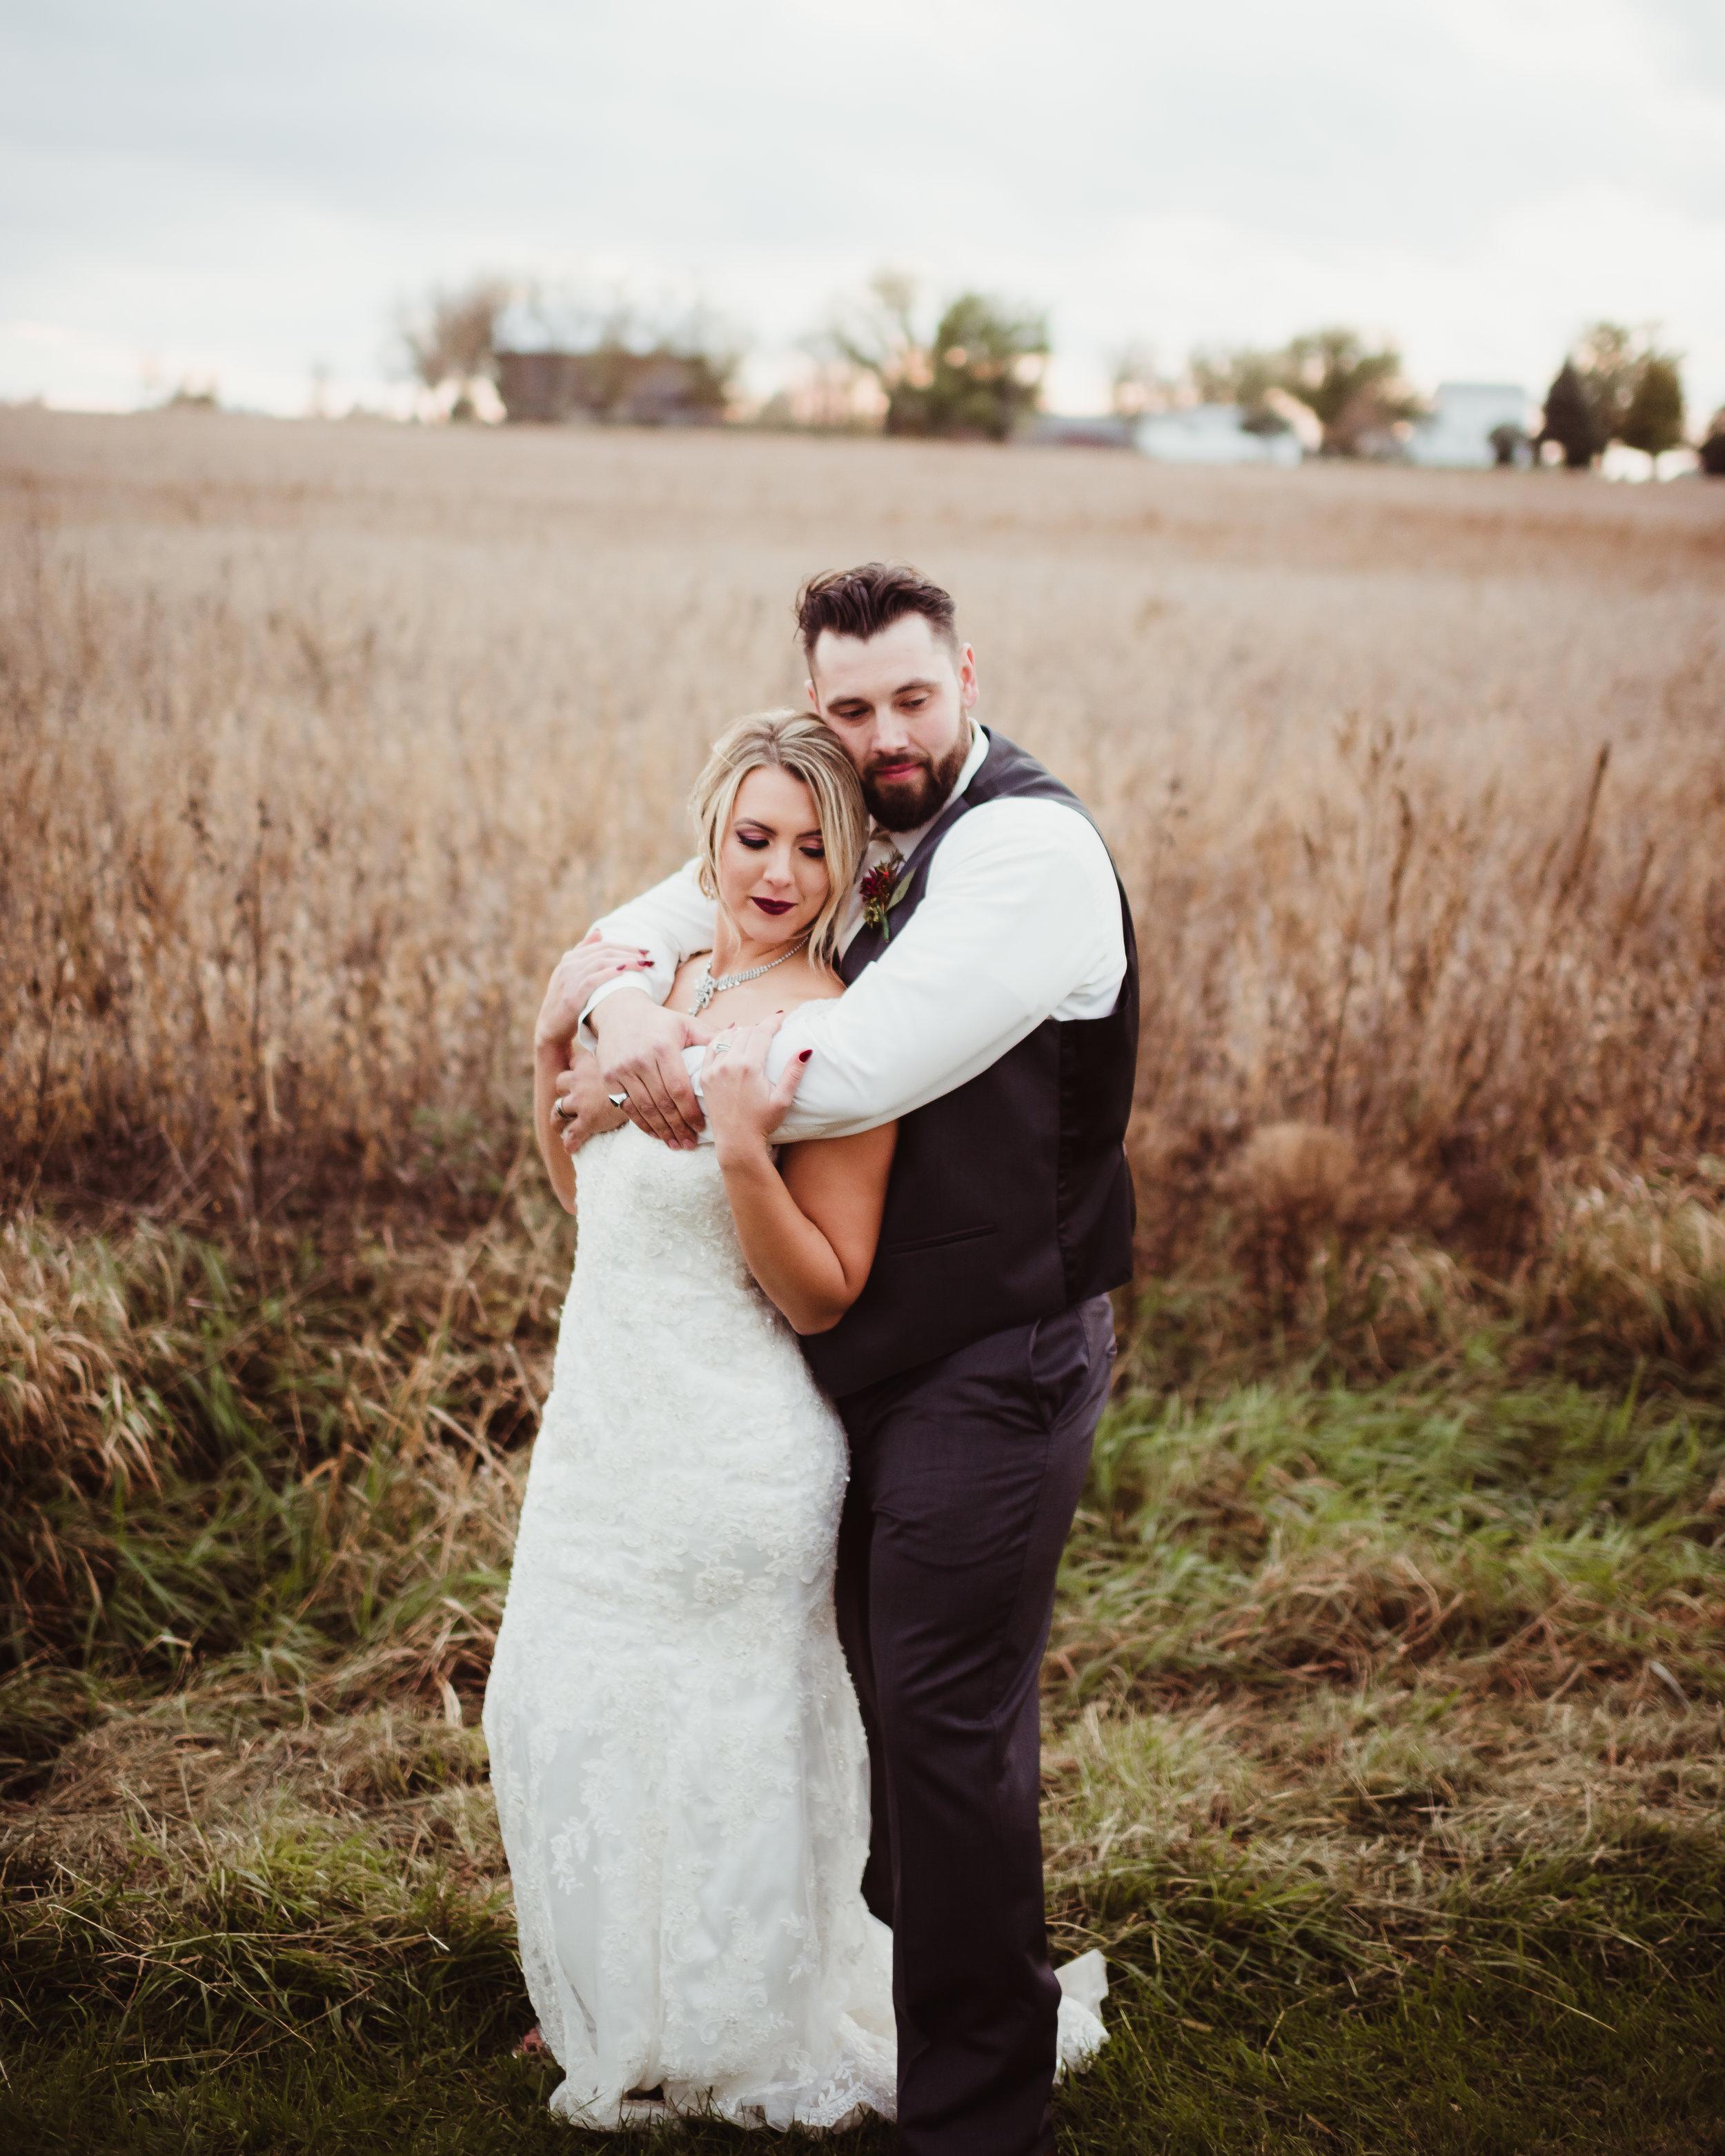 Anthony & Tamara's Wedding.1-850.jpg